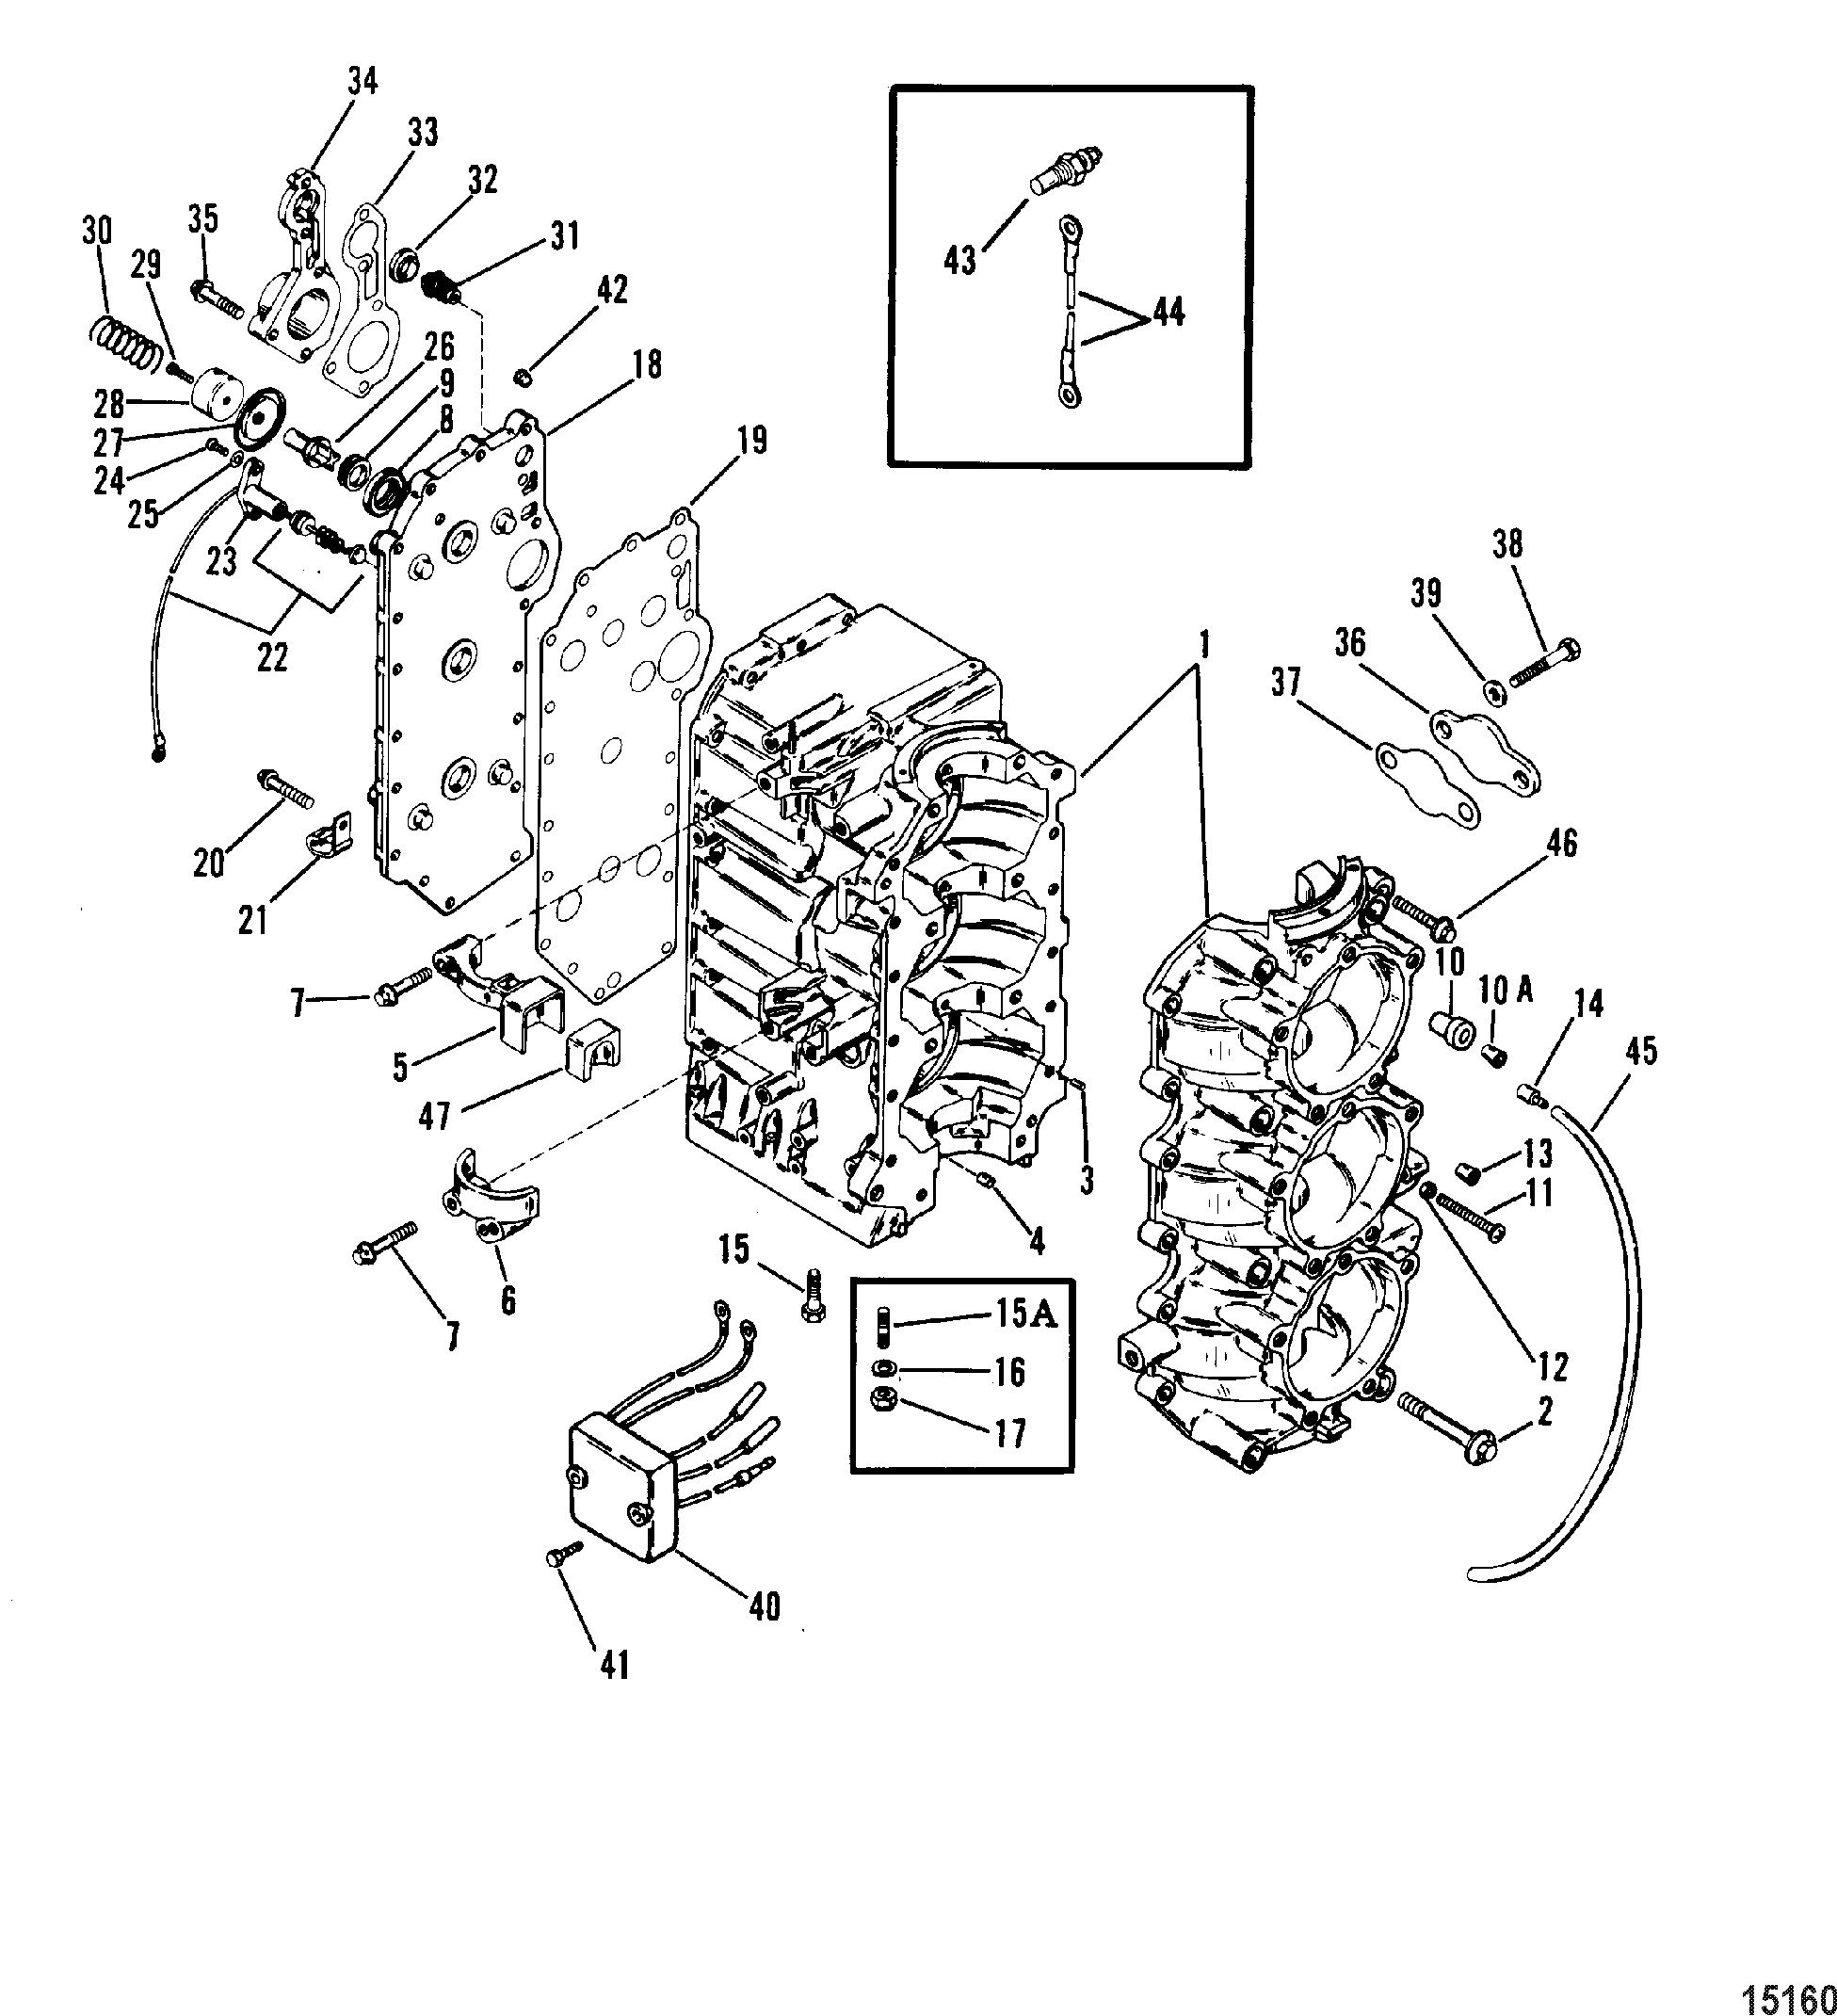 Cylinder Block And Crankcase For Mariner Mercury 70 75